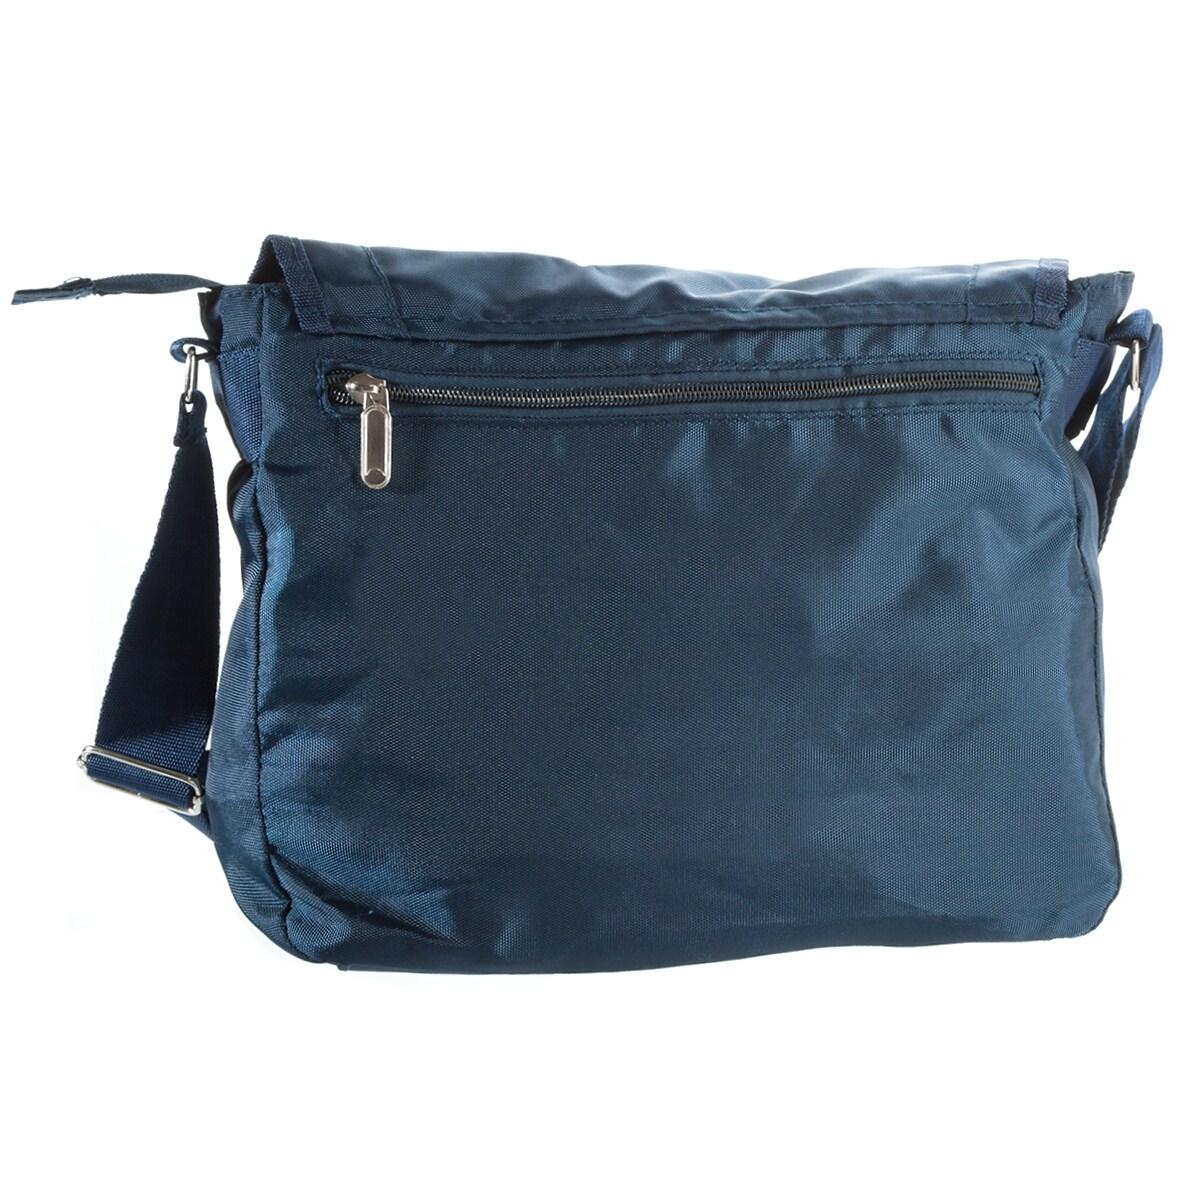 Suvelle Lightweight Flapper Travel Everyday Crossbody Bag Multi Pocket Shoulder Handbag 9902